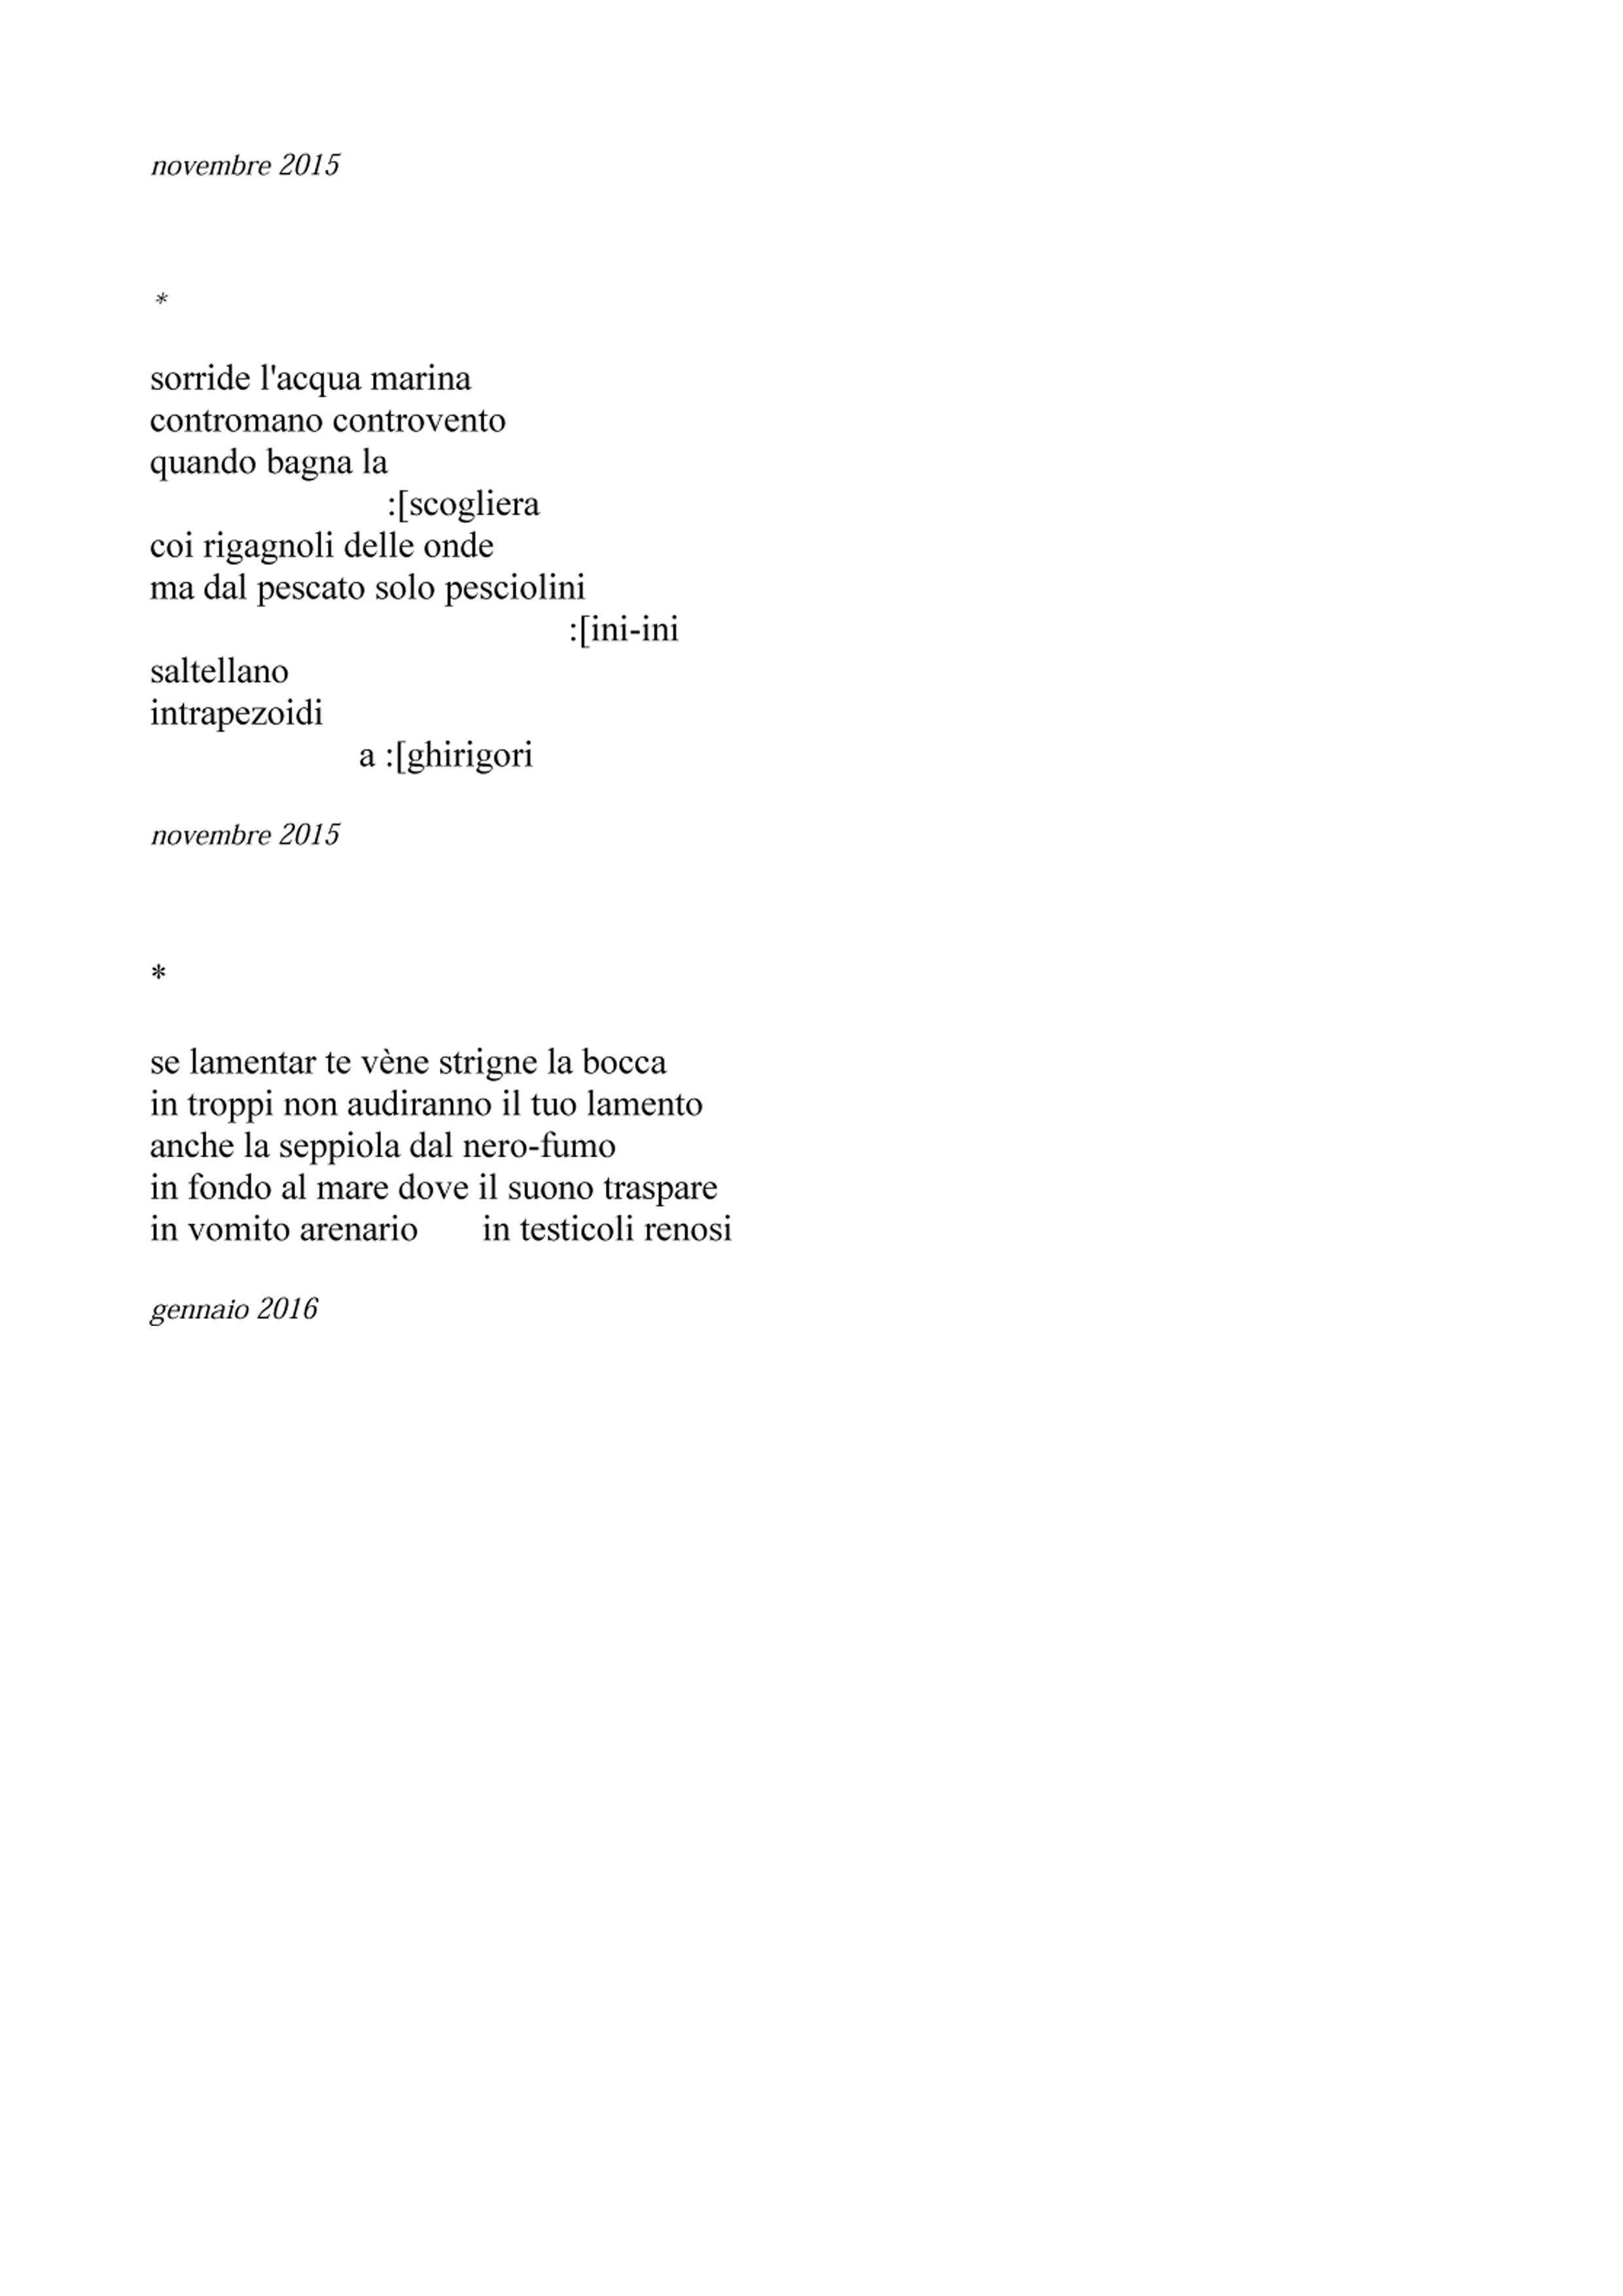 giorgio moio - utsanga - marzo 2016_03